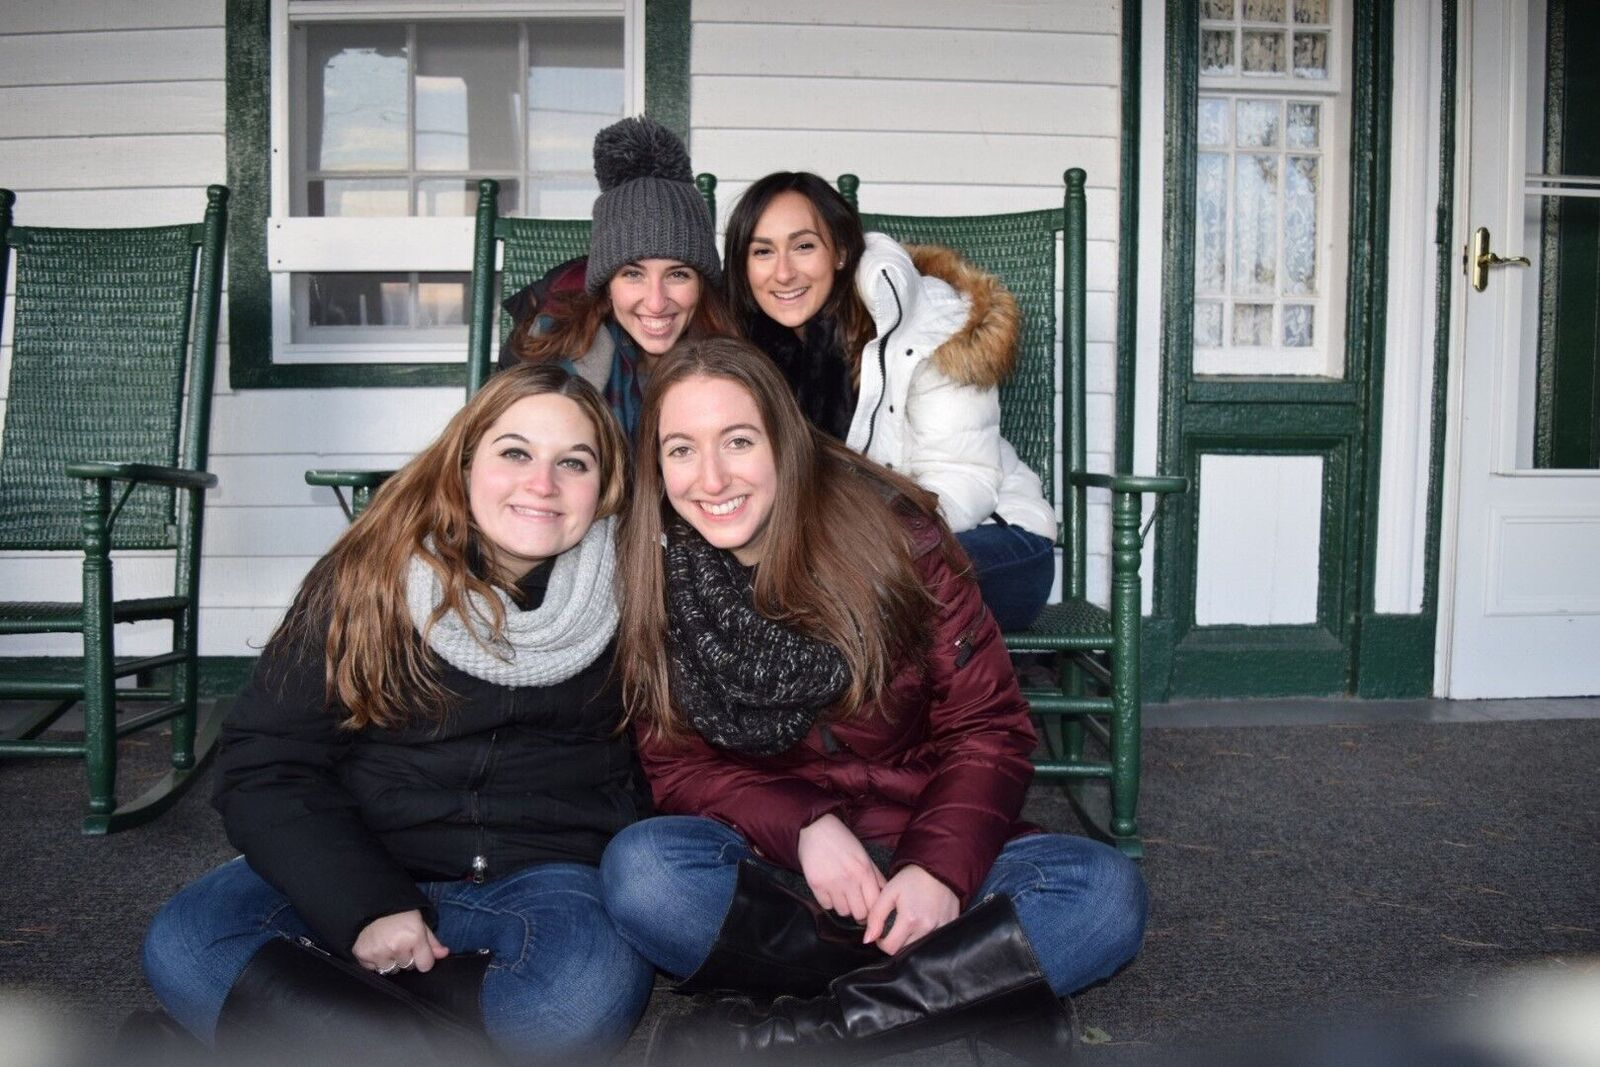 Nicki, Julie, Emily and Sydnee